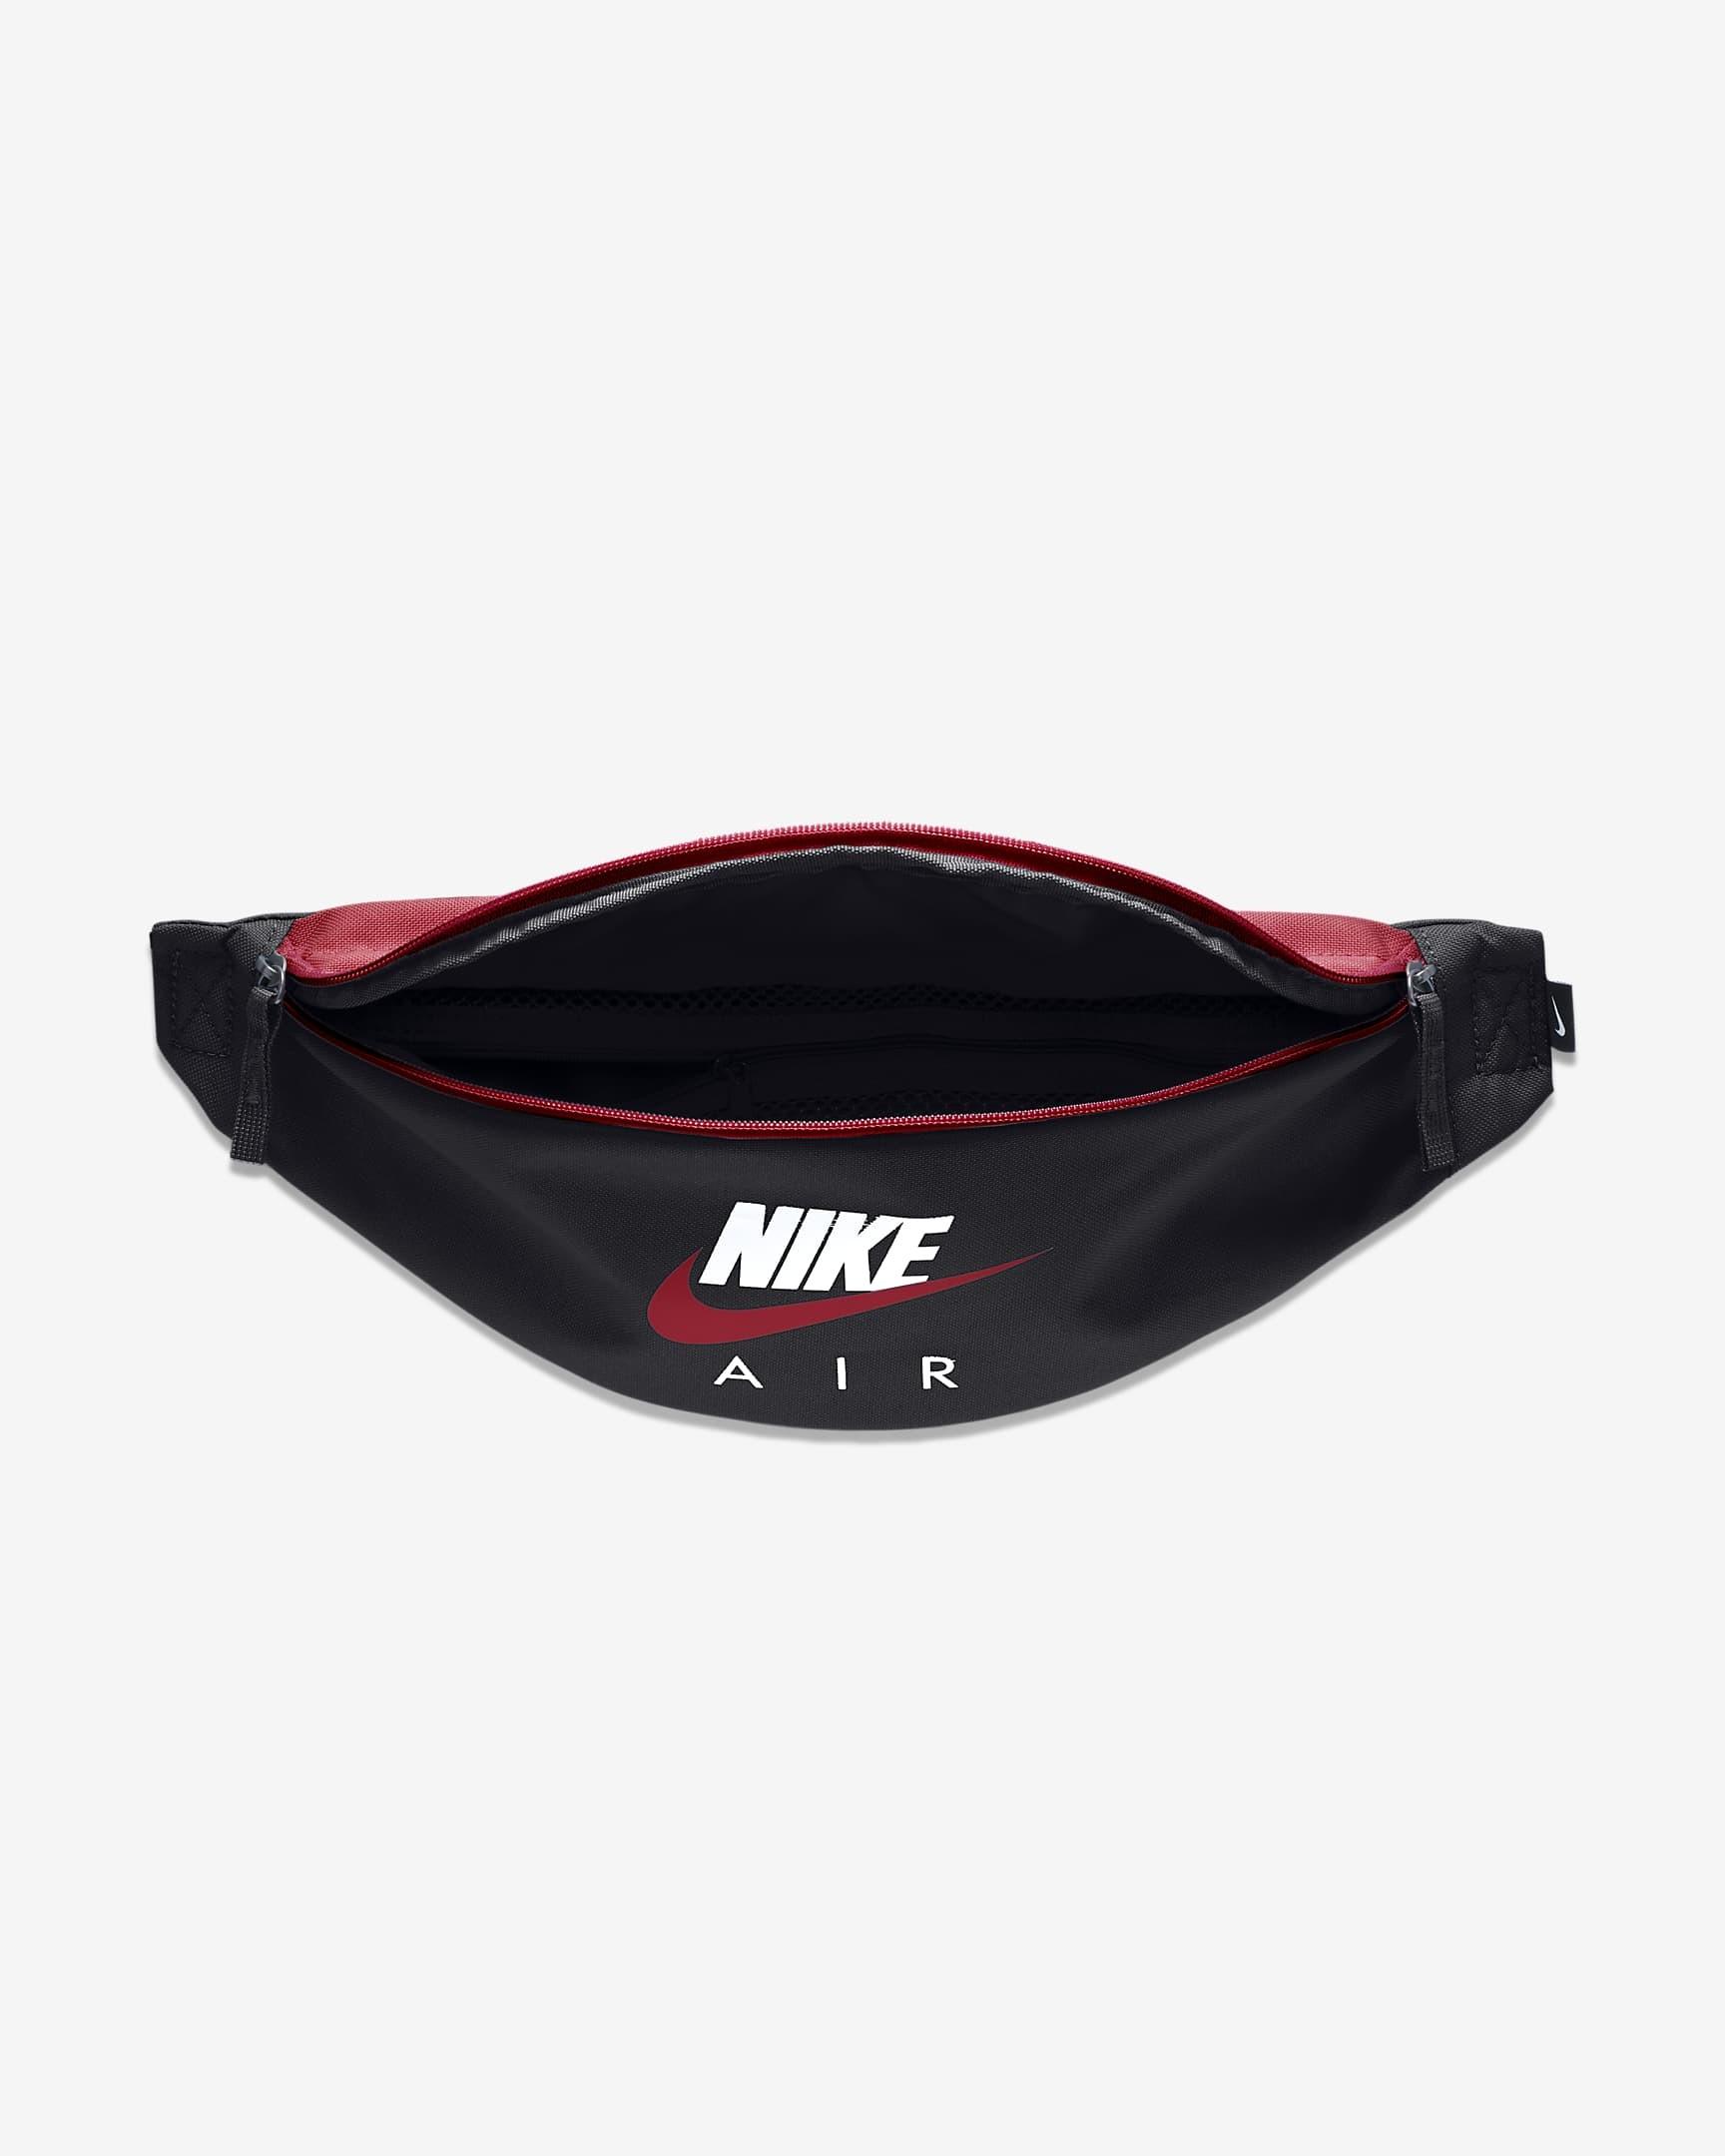 Nike Sportswear Heritage AIR marsupio borsa tracolla tg Nero 0